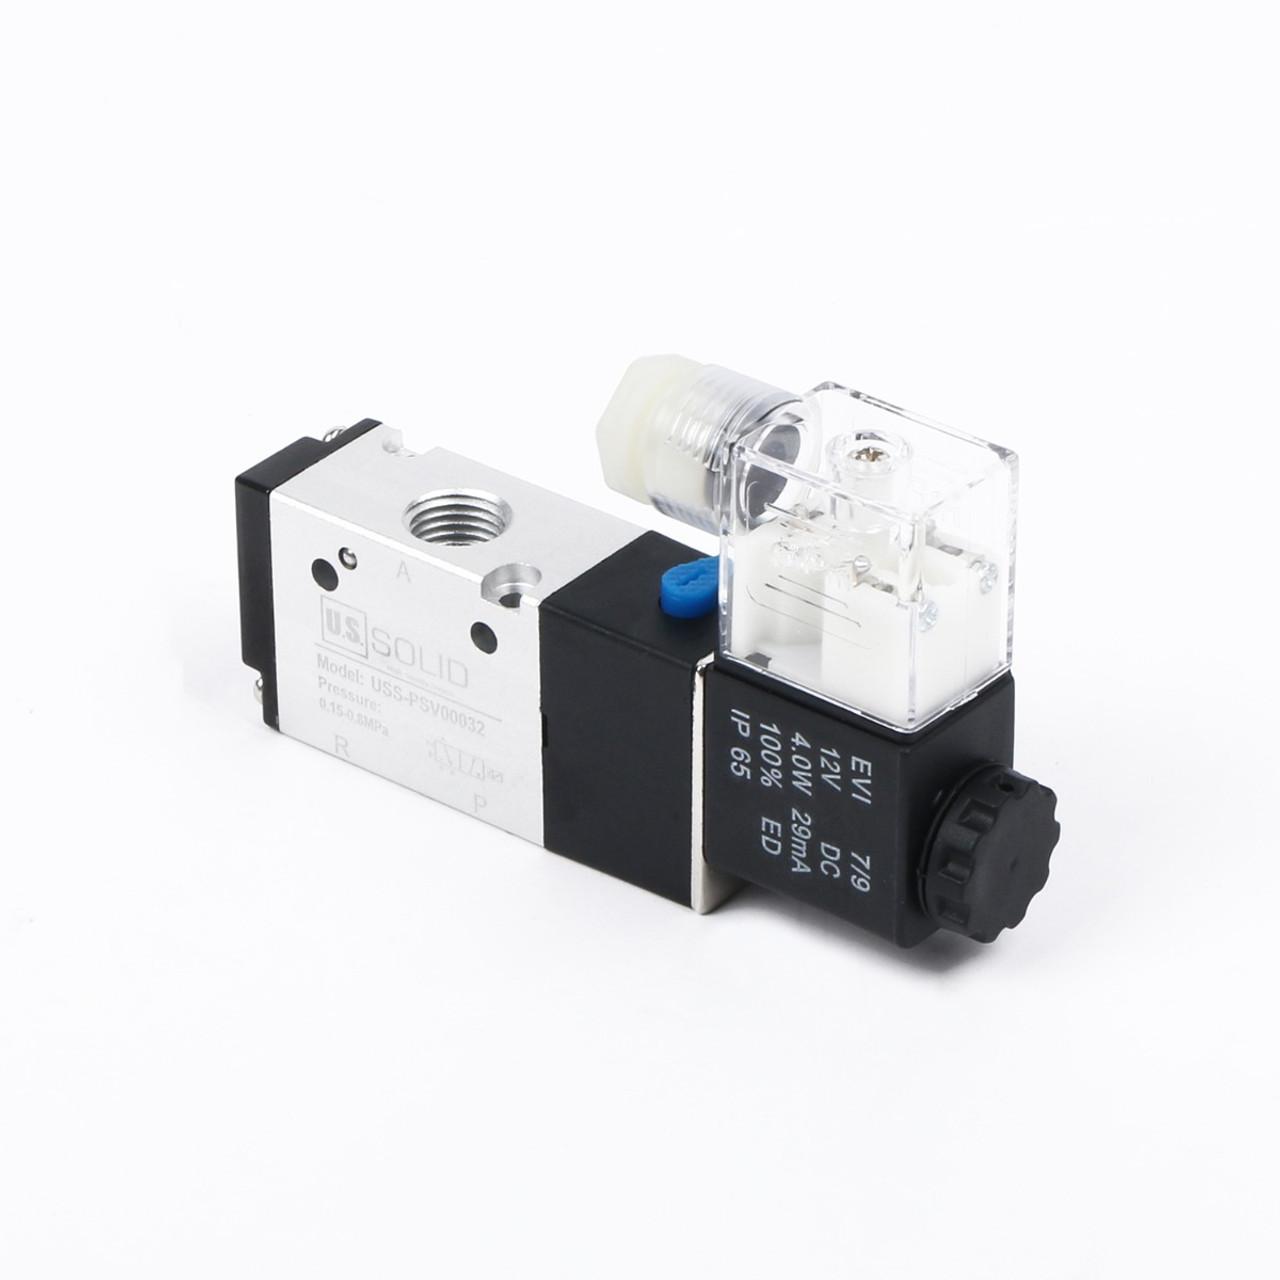 medium resolution of ussolid 1 4 3 way 2 position pneumatic electric solenoid valve dc